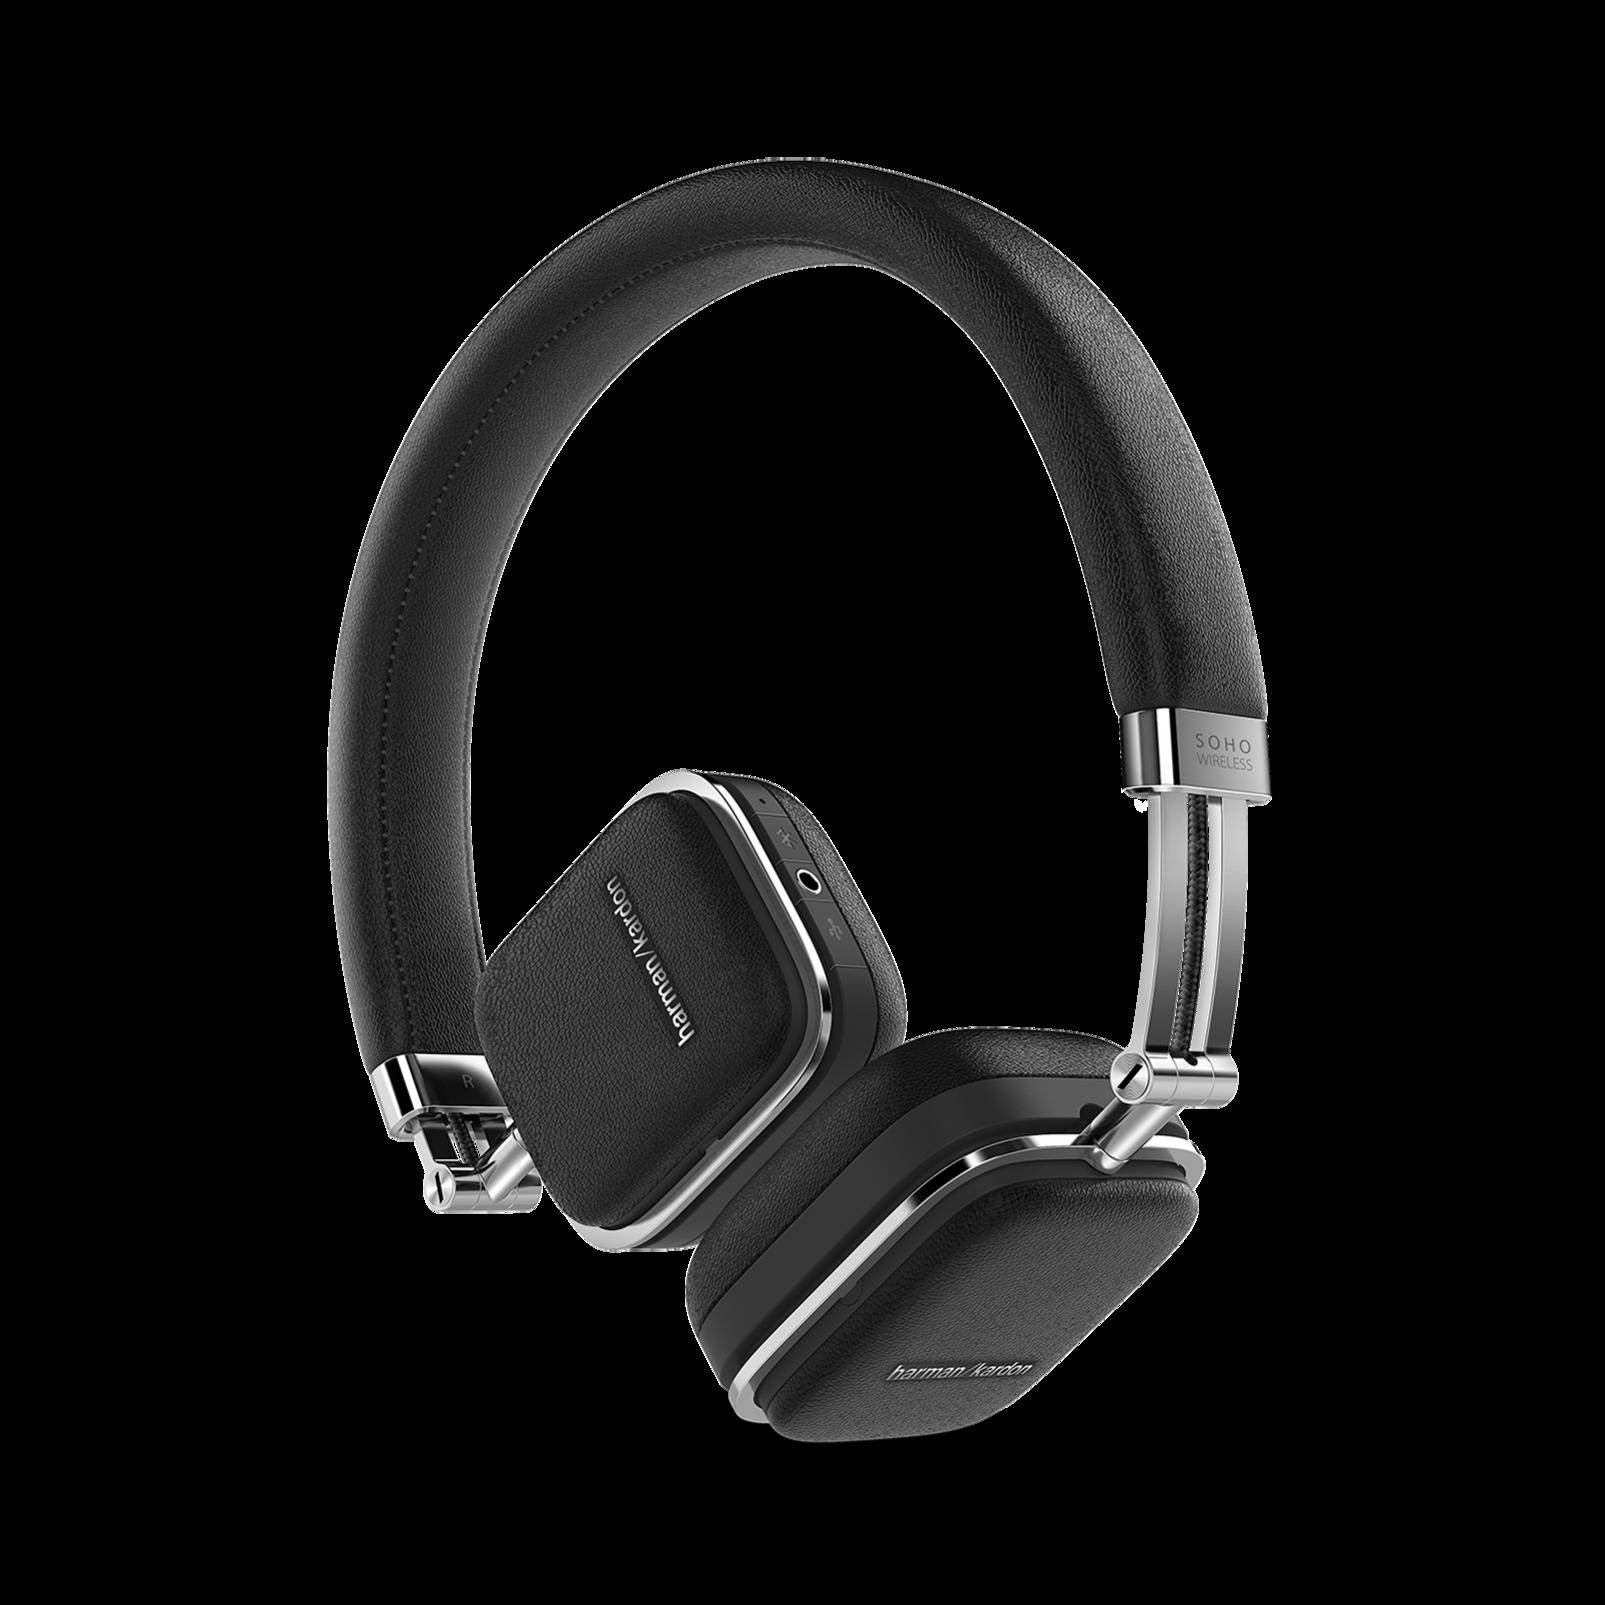 Harman Kardon Soho Wireless On Ear Headphones Refurbished 6999 Fs Razer Kraken Pro V2 Black